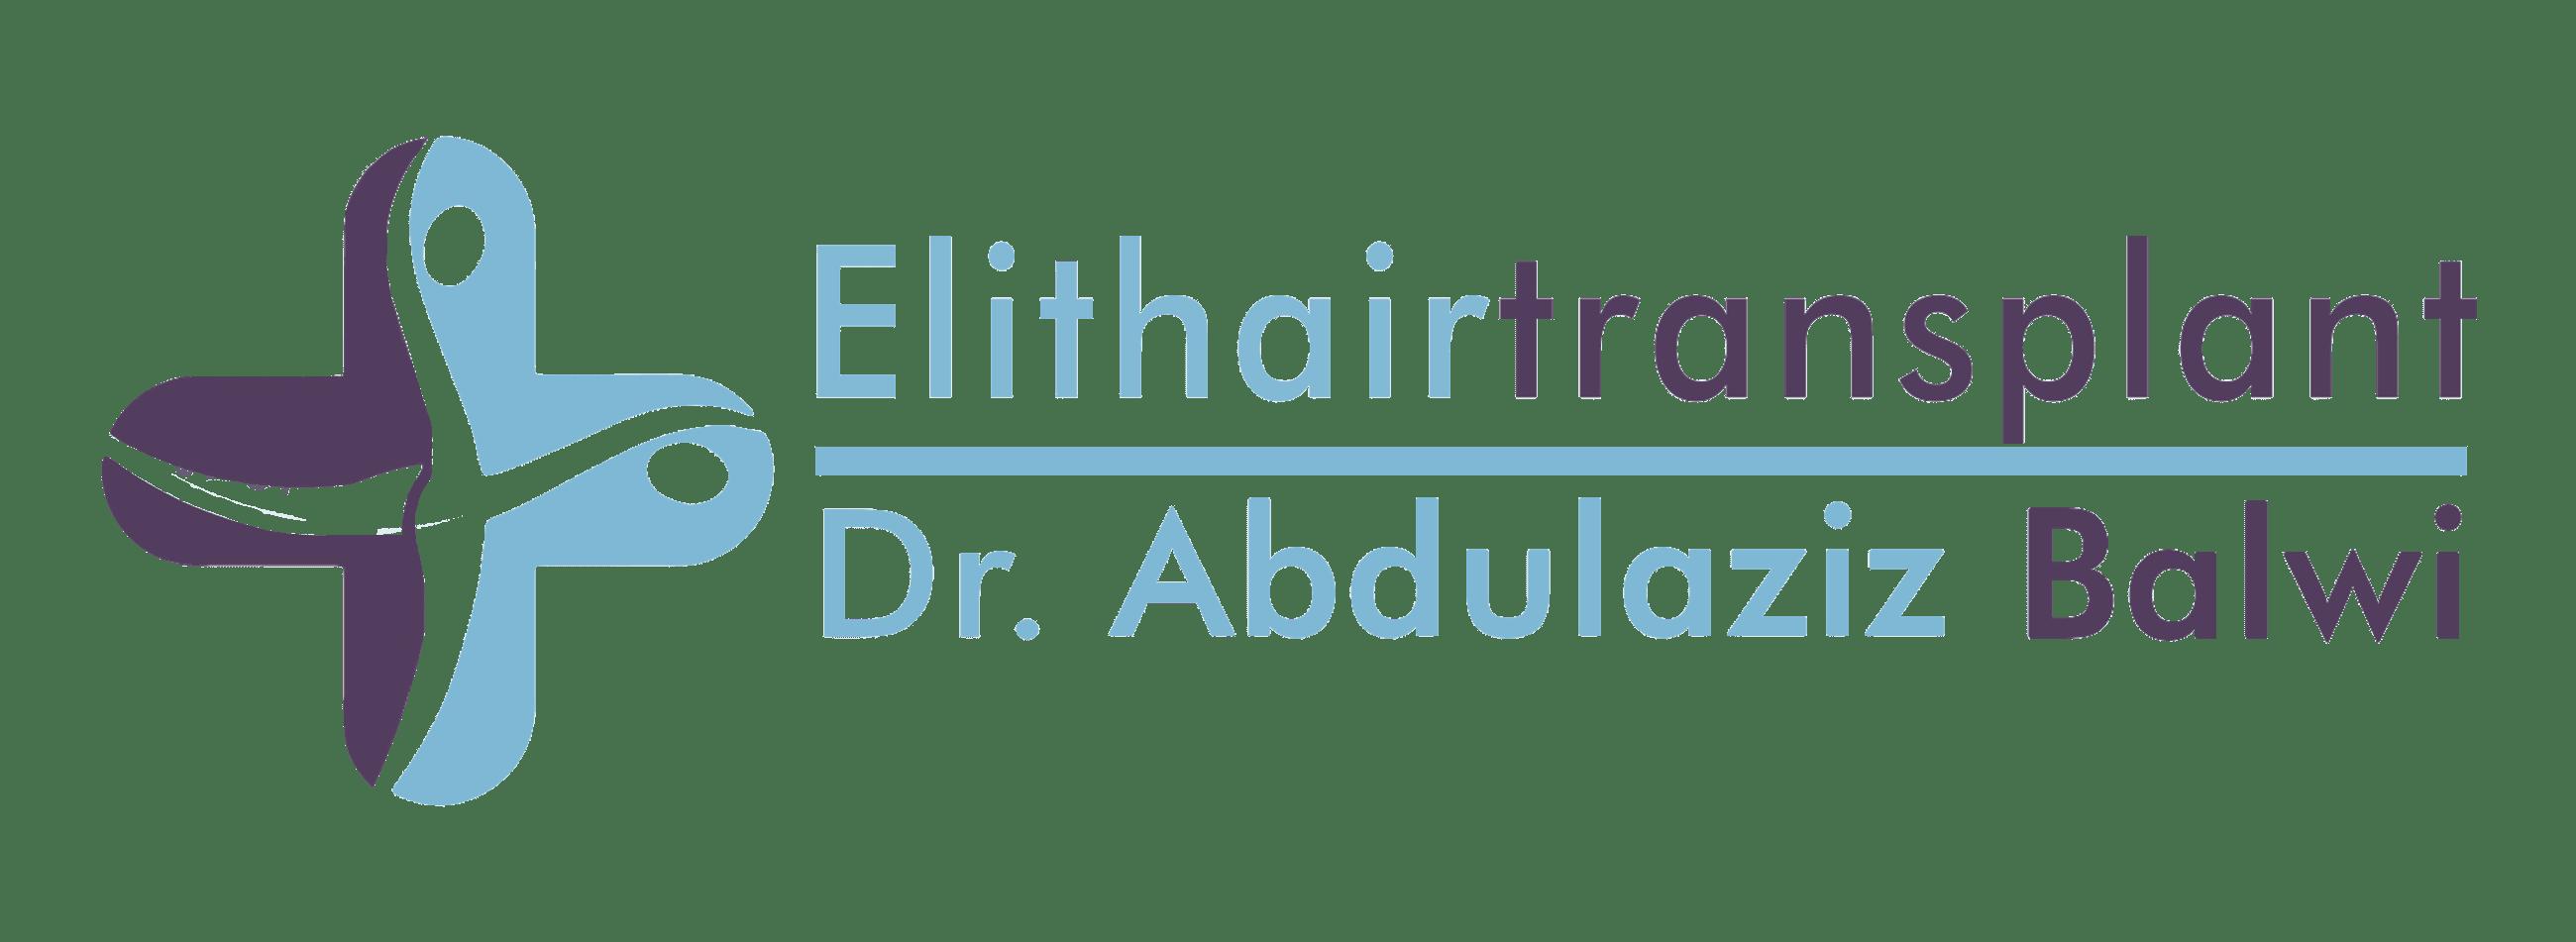 Dr. Abdulaziz Balwi